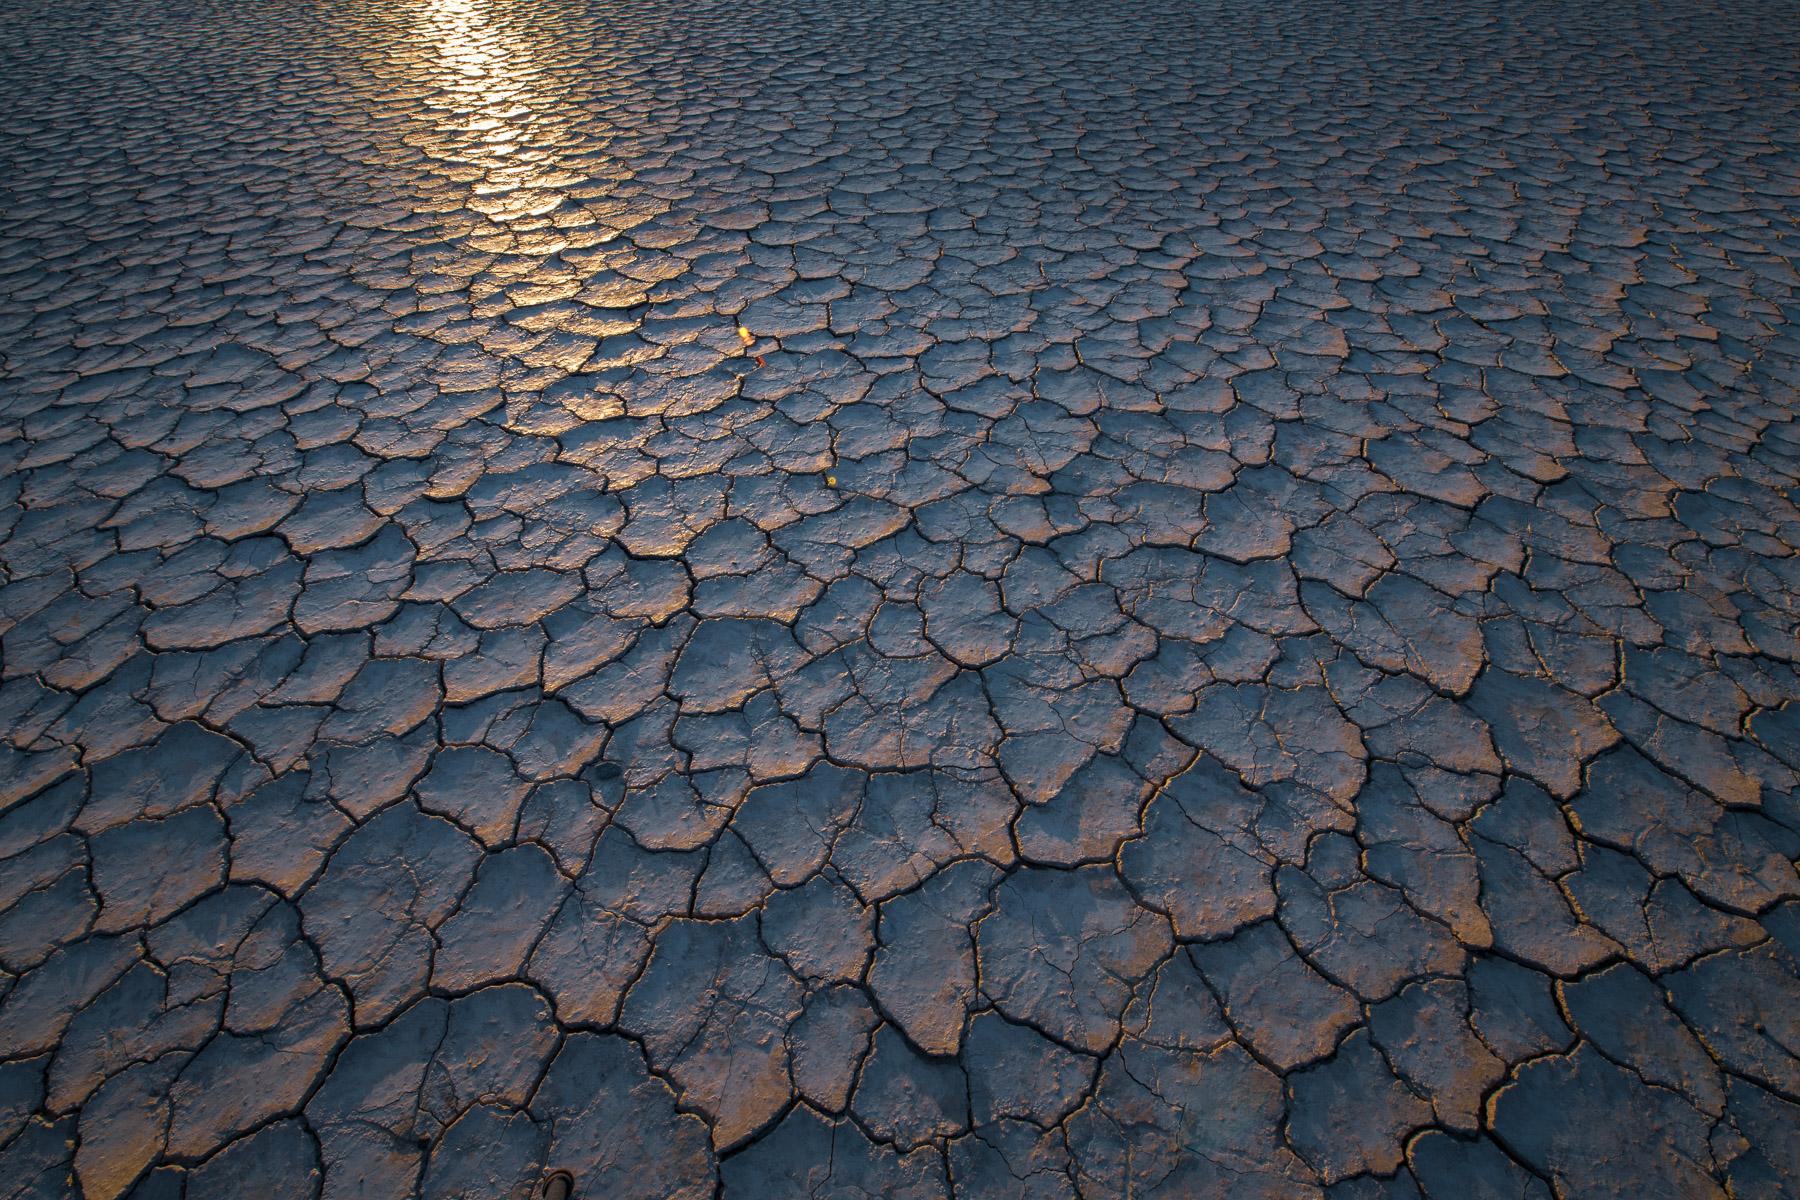 Cracked mud patterns on the Alvord Desert, Oregon.